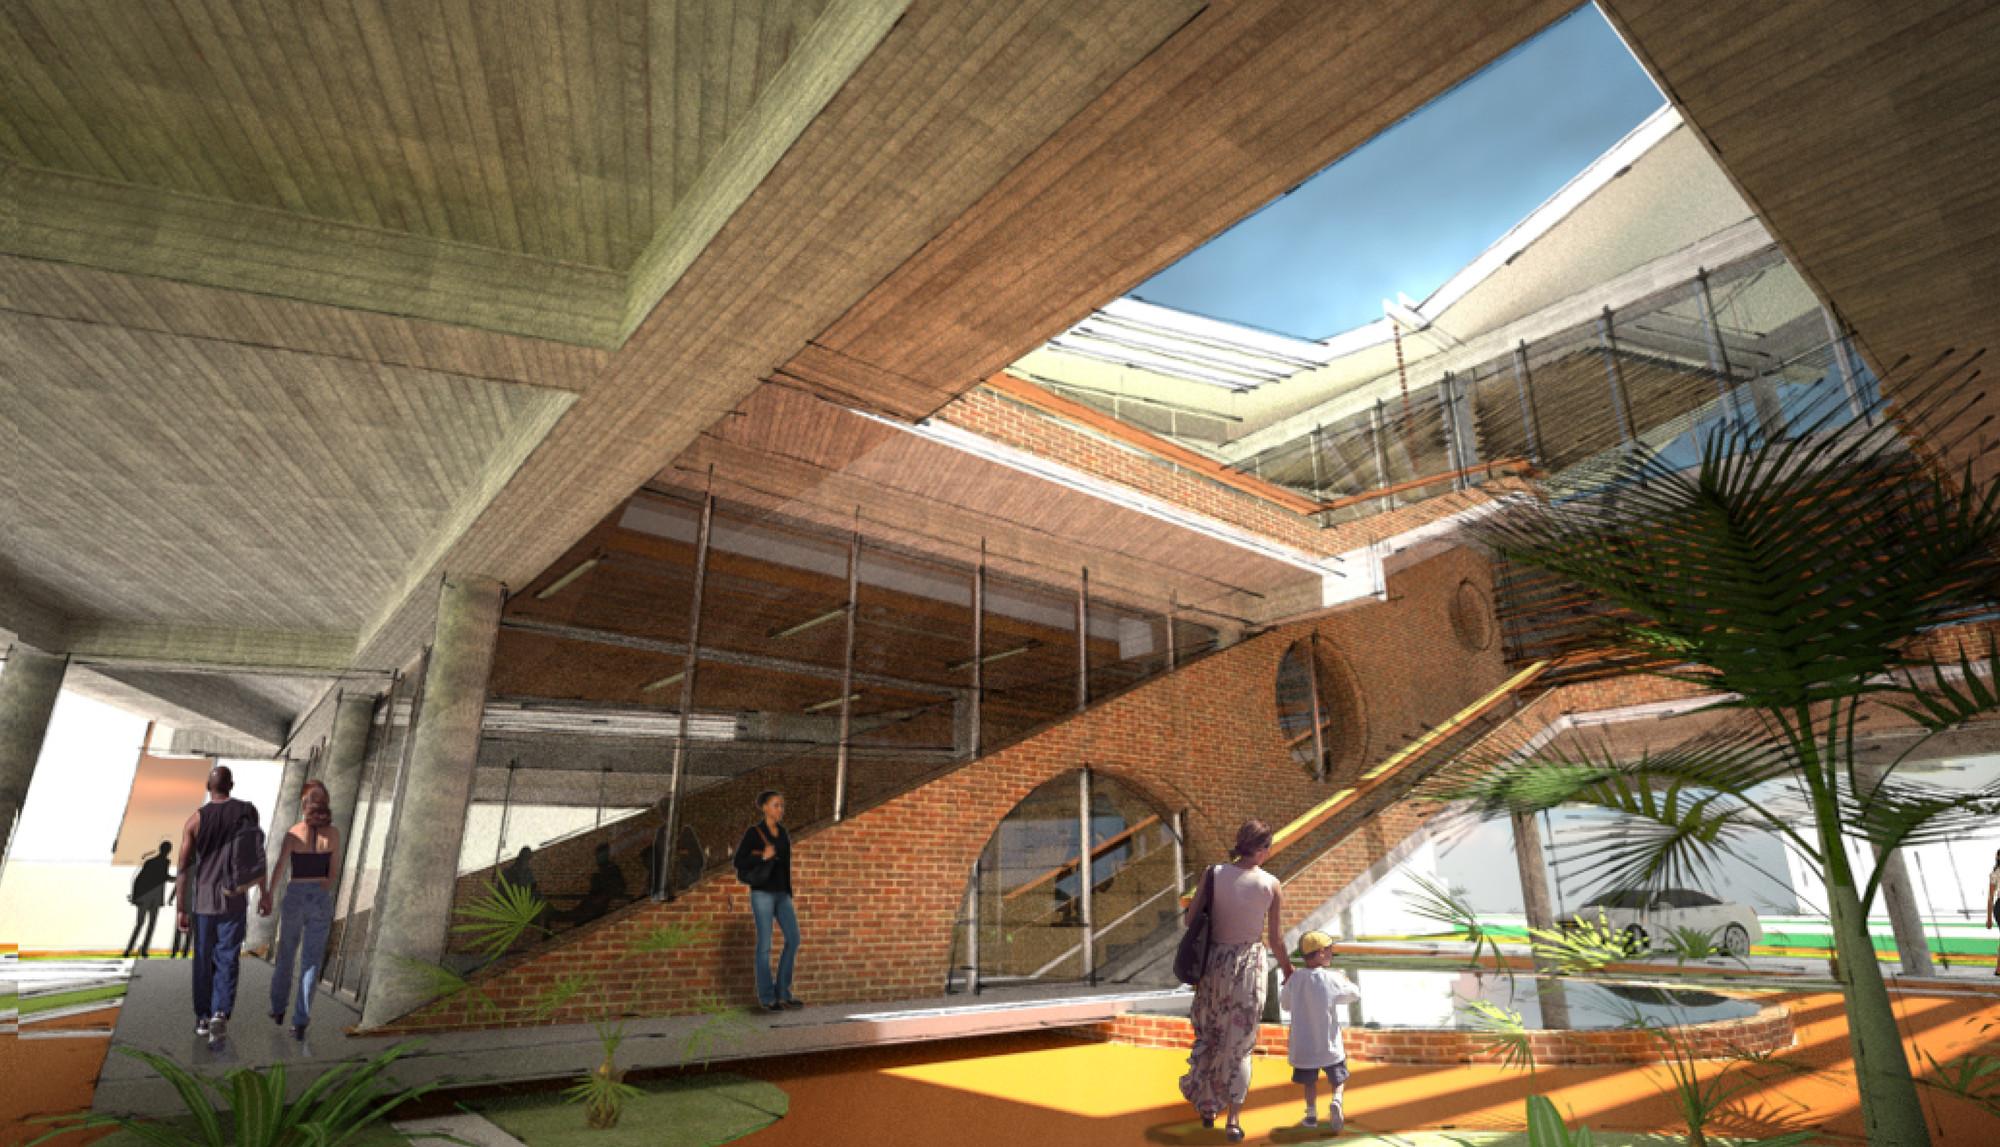 NLÉ Wins Competition to Design Financial Headquarters in Lagos, Atrium Ground Floor. Image © NLÉ